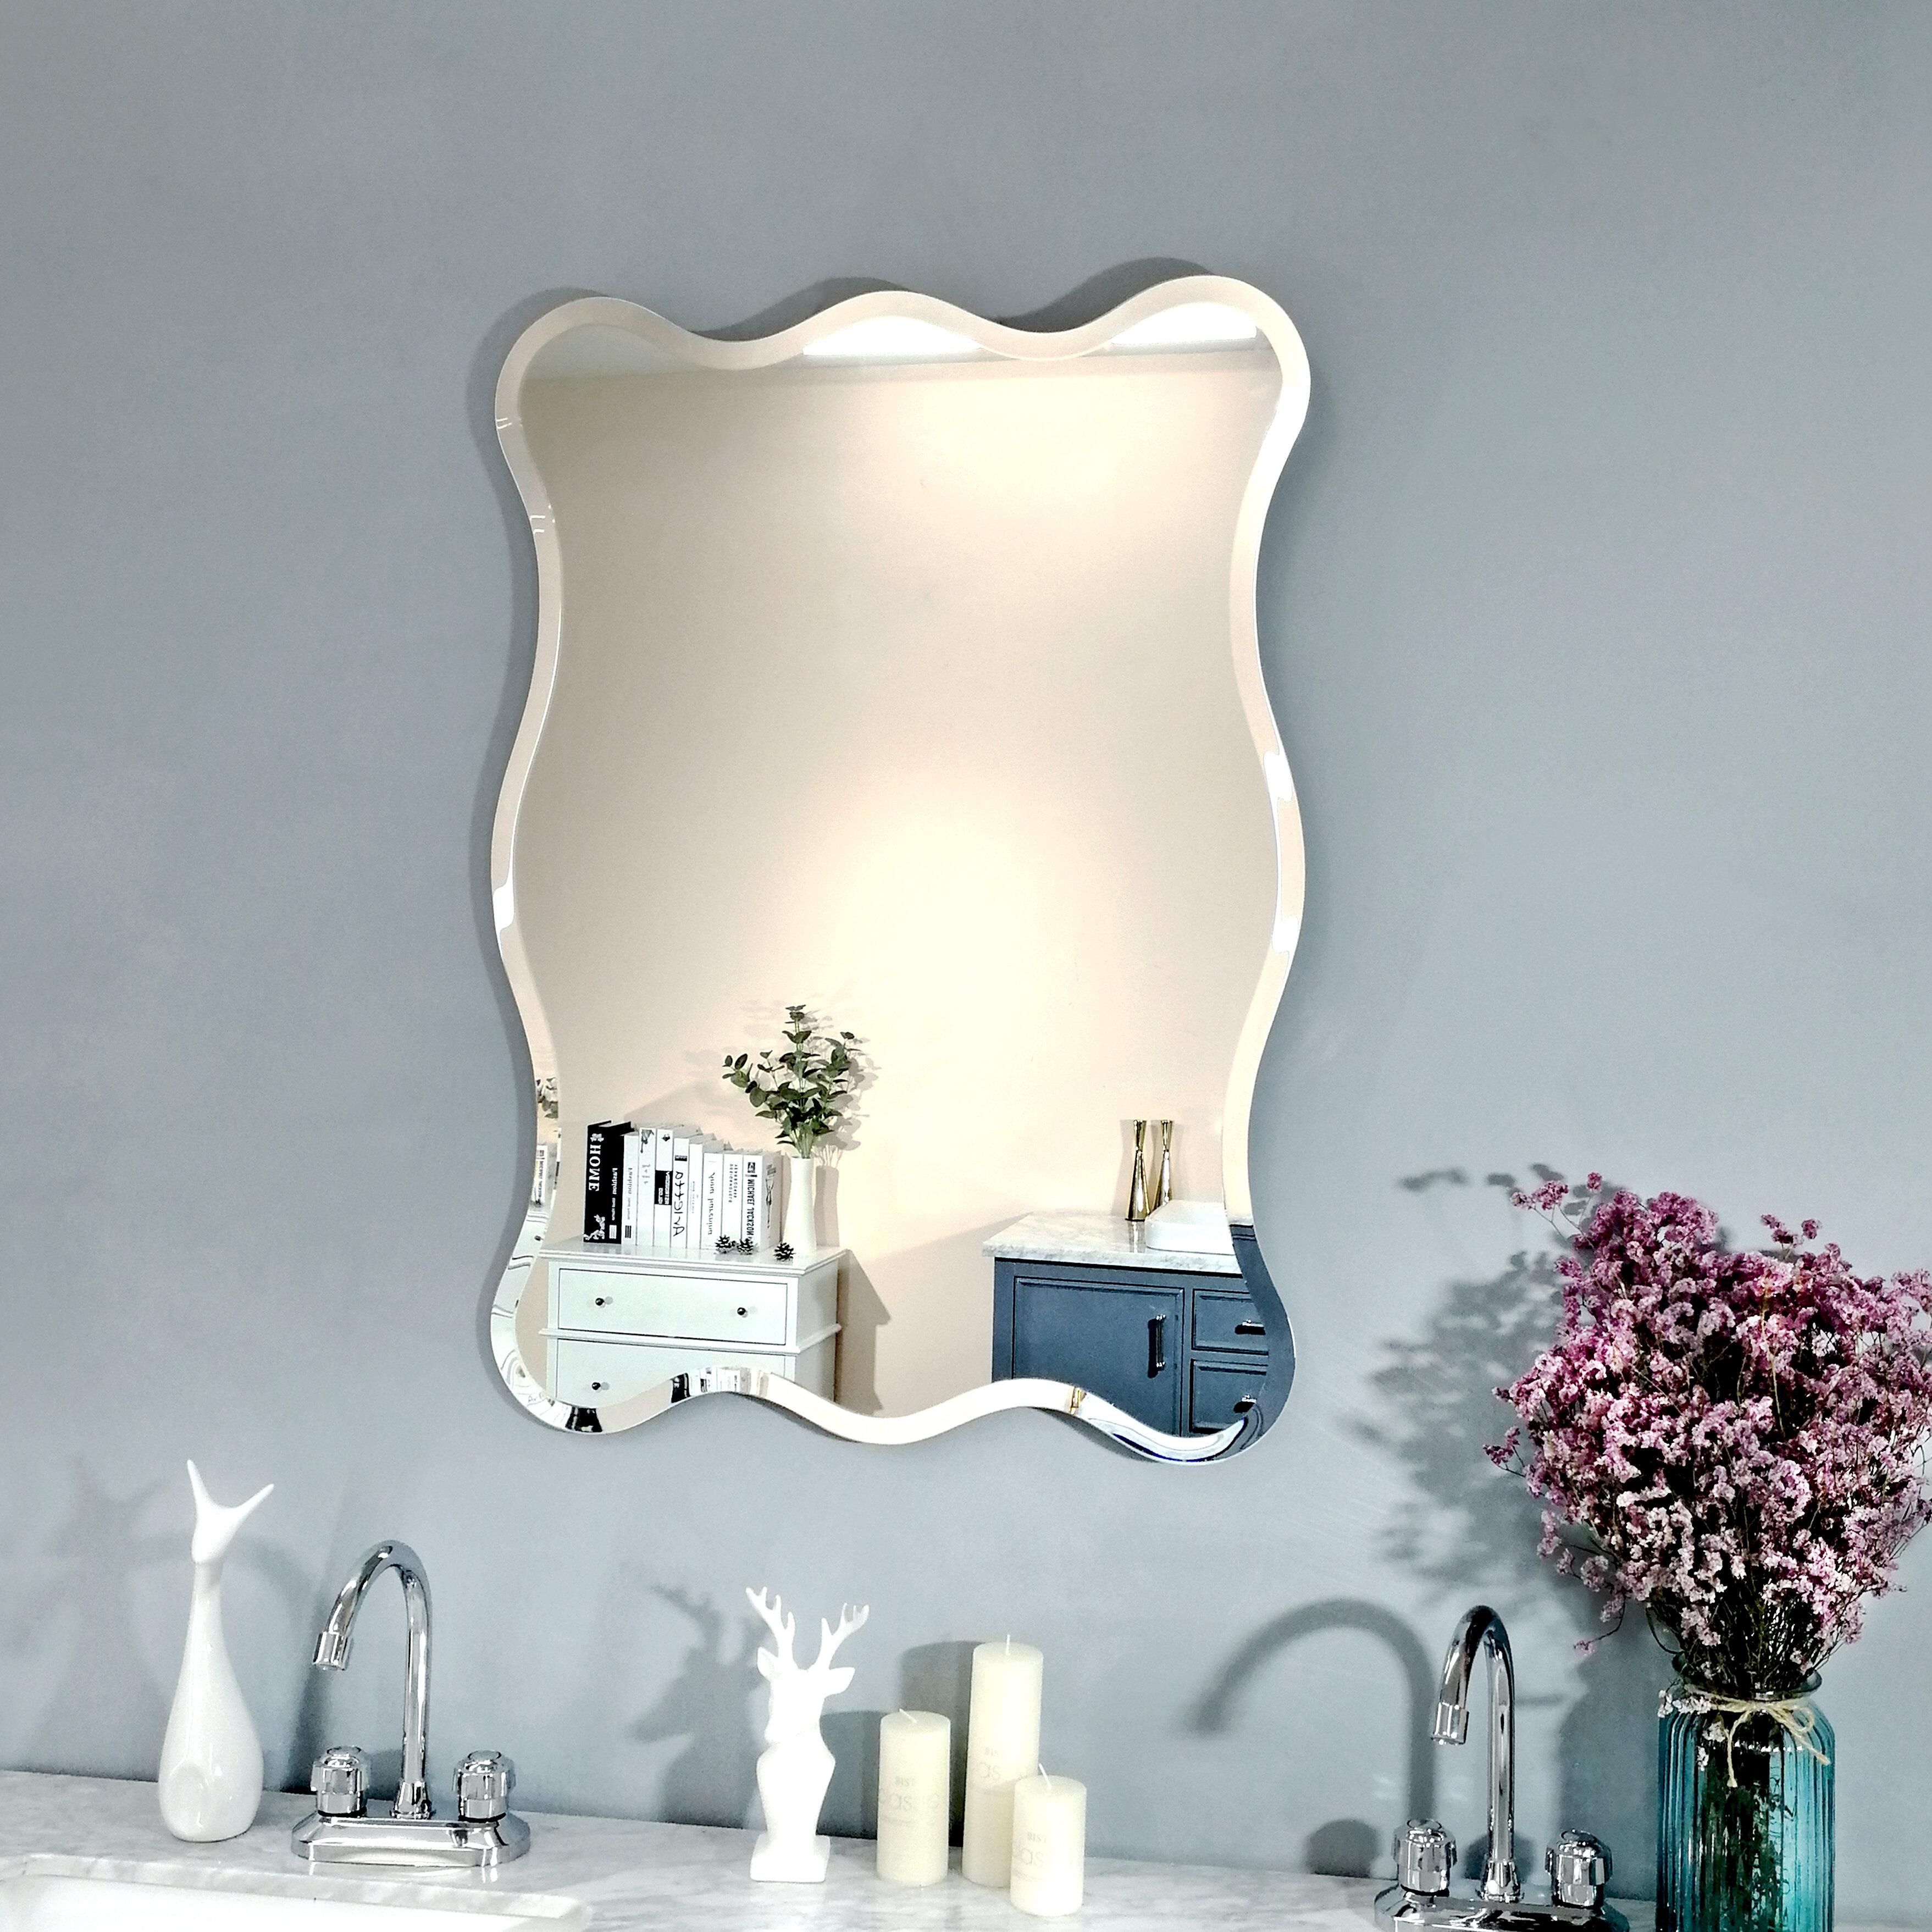 House Of Hampton Ratliff Wave Beveled Venetian Frameless Wall Mirror Reviews Wayfair Ca